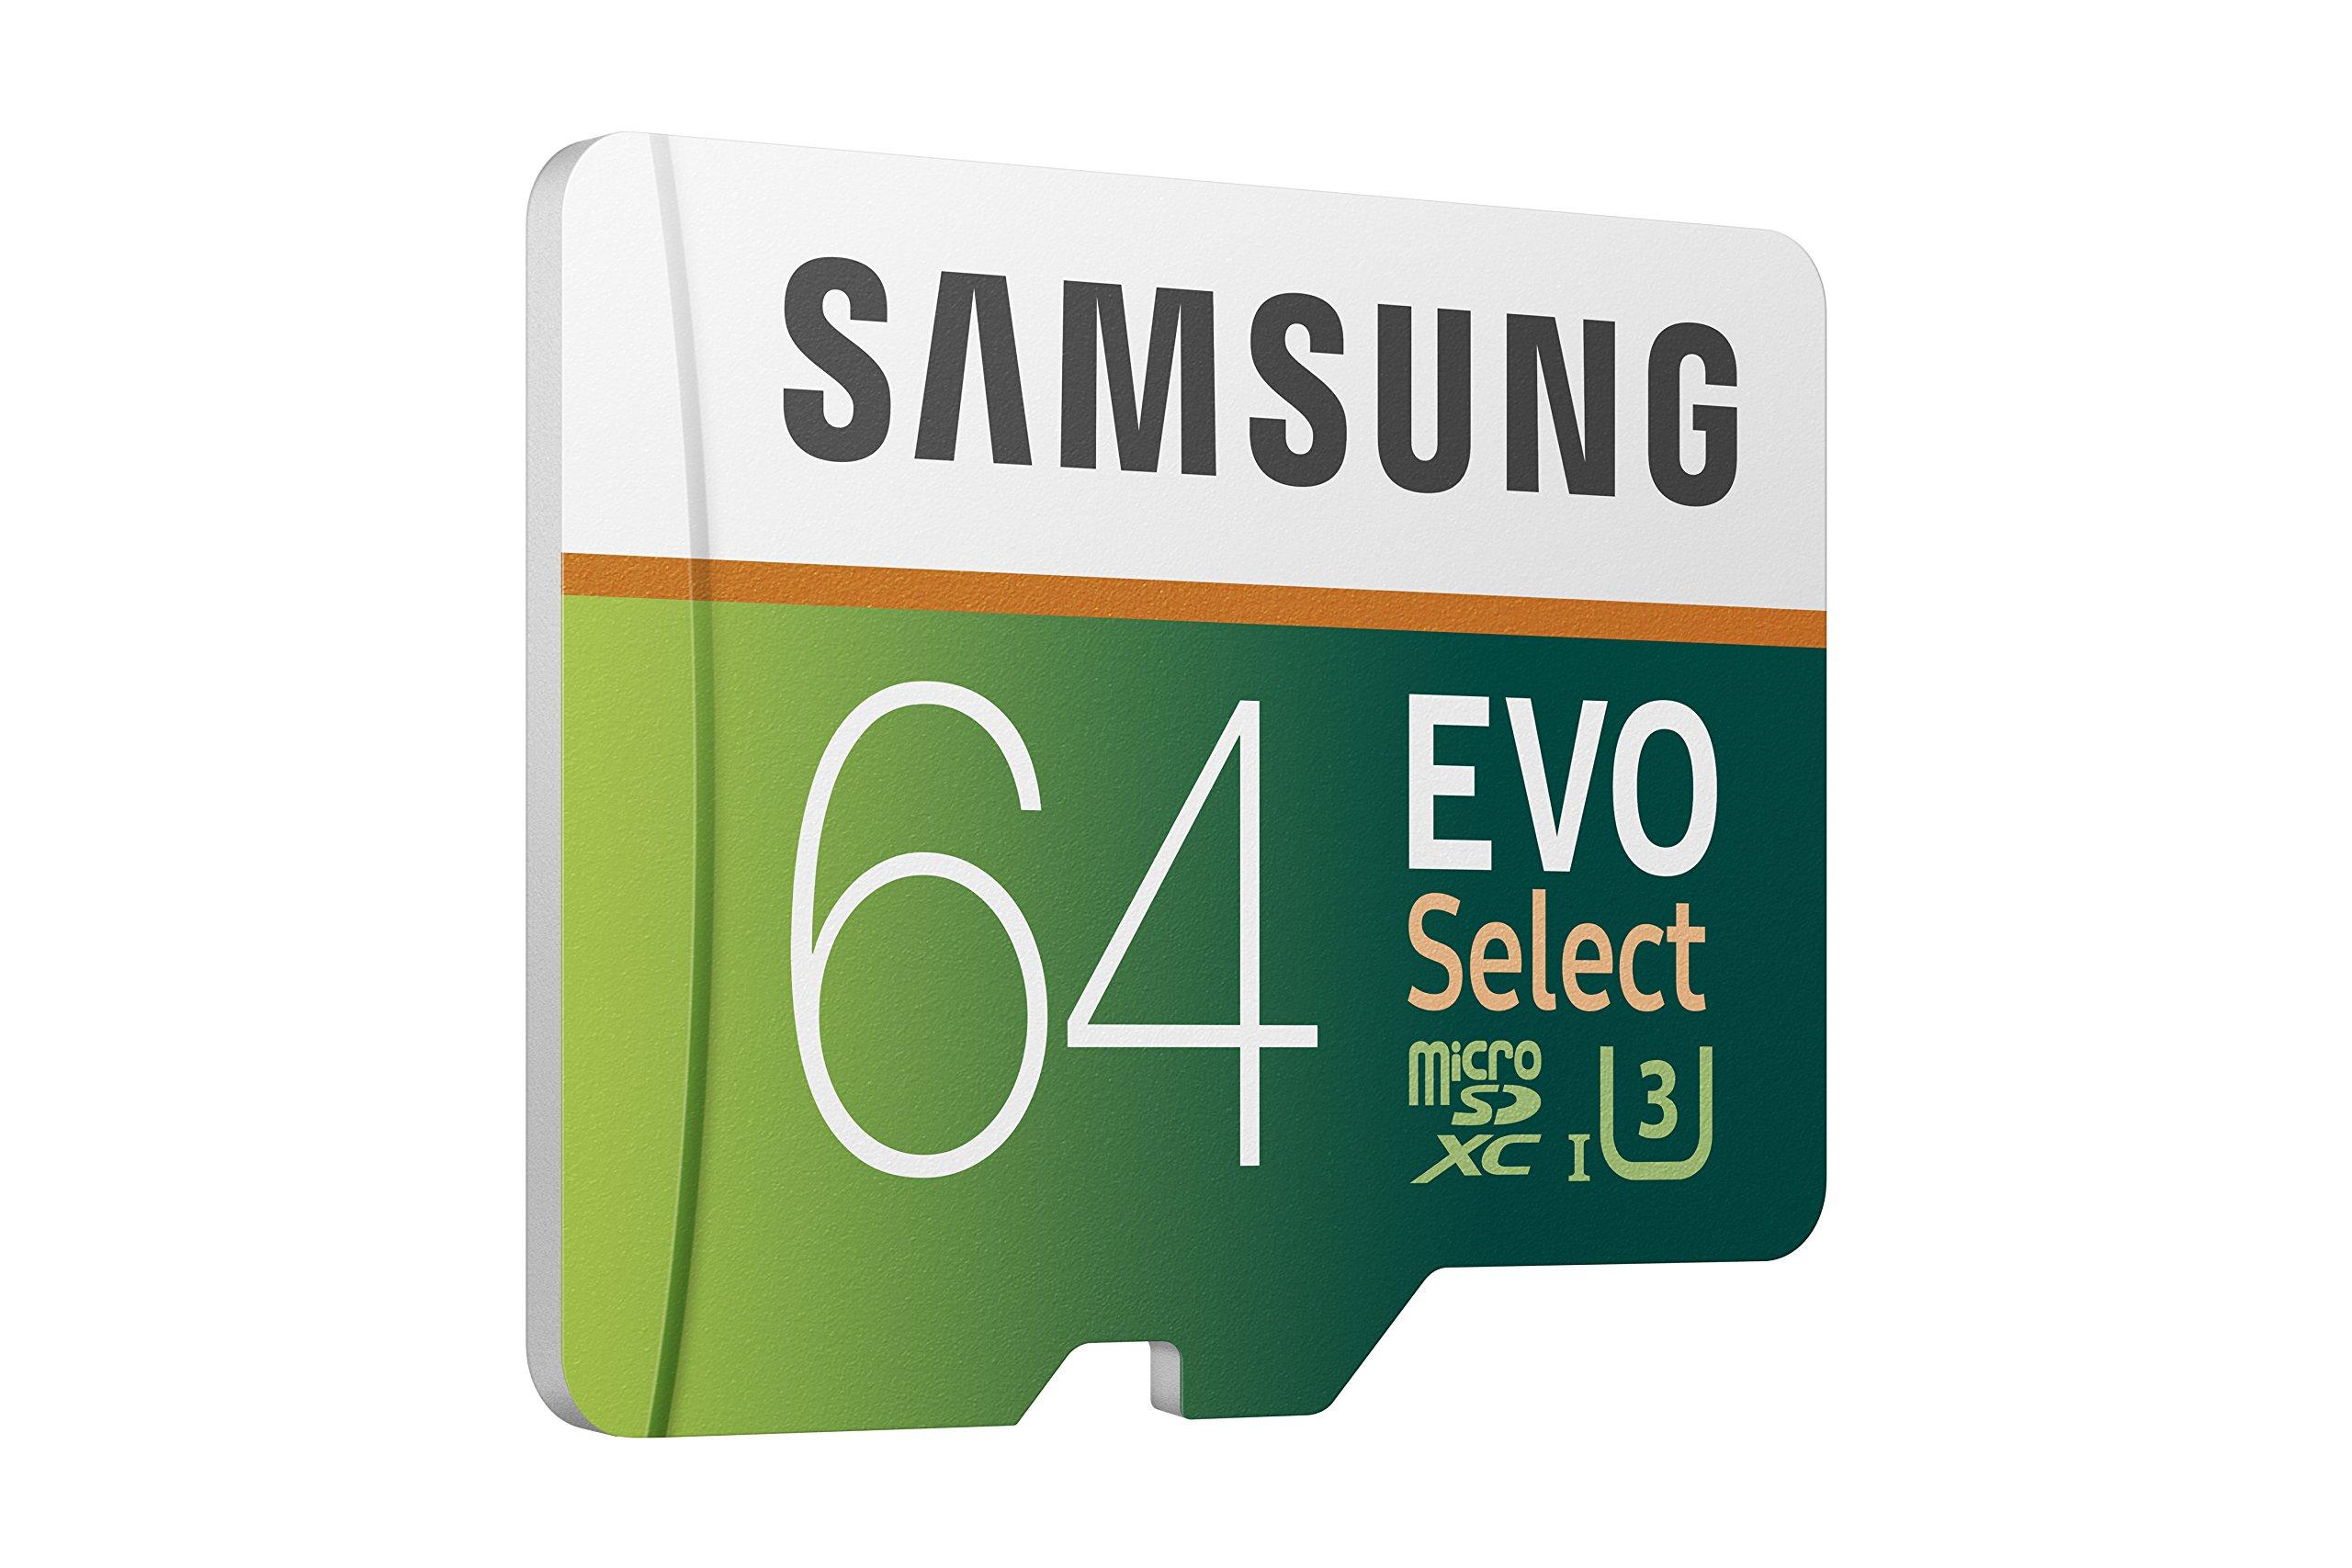 Samsung 64GB 100MB/s (U3) MicroSDXC EVO Select Memory Card with Adapter (MB-ME64GA/AM) by Samsung (Image #4)